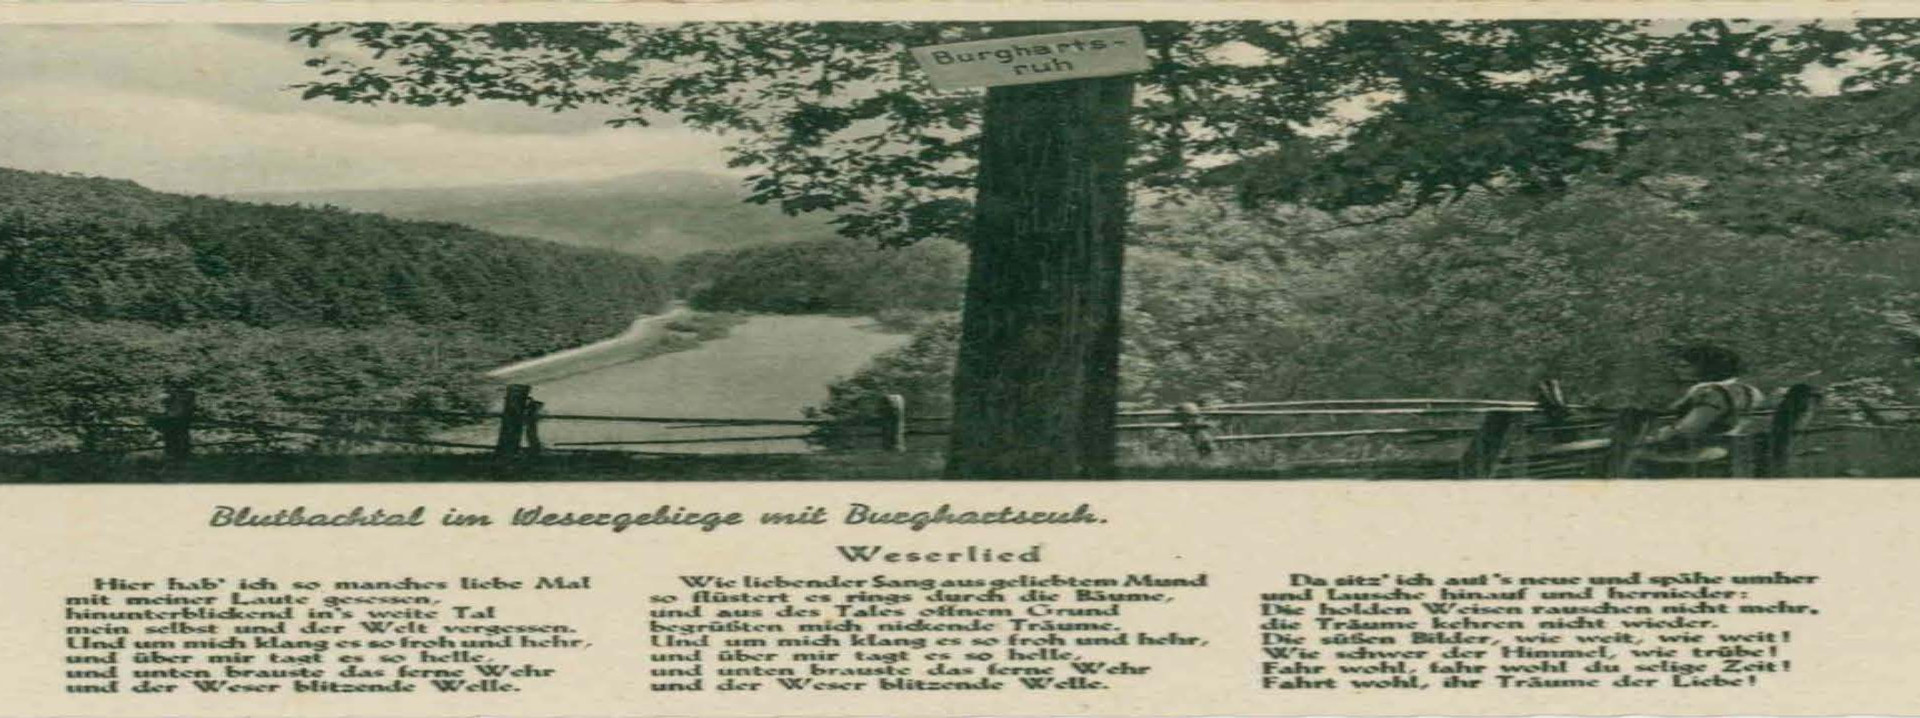 Burghartsruh